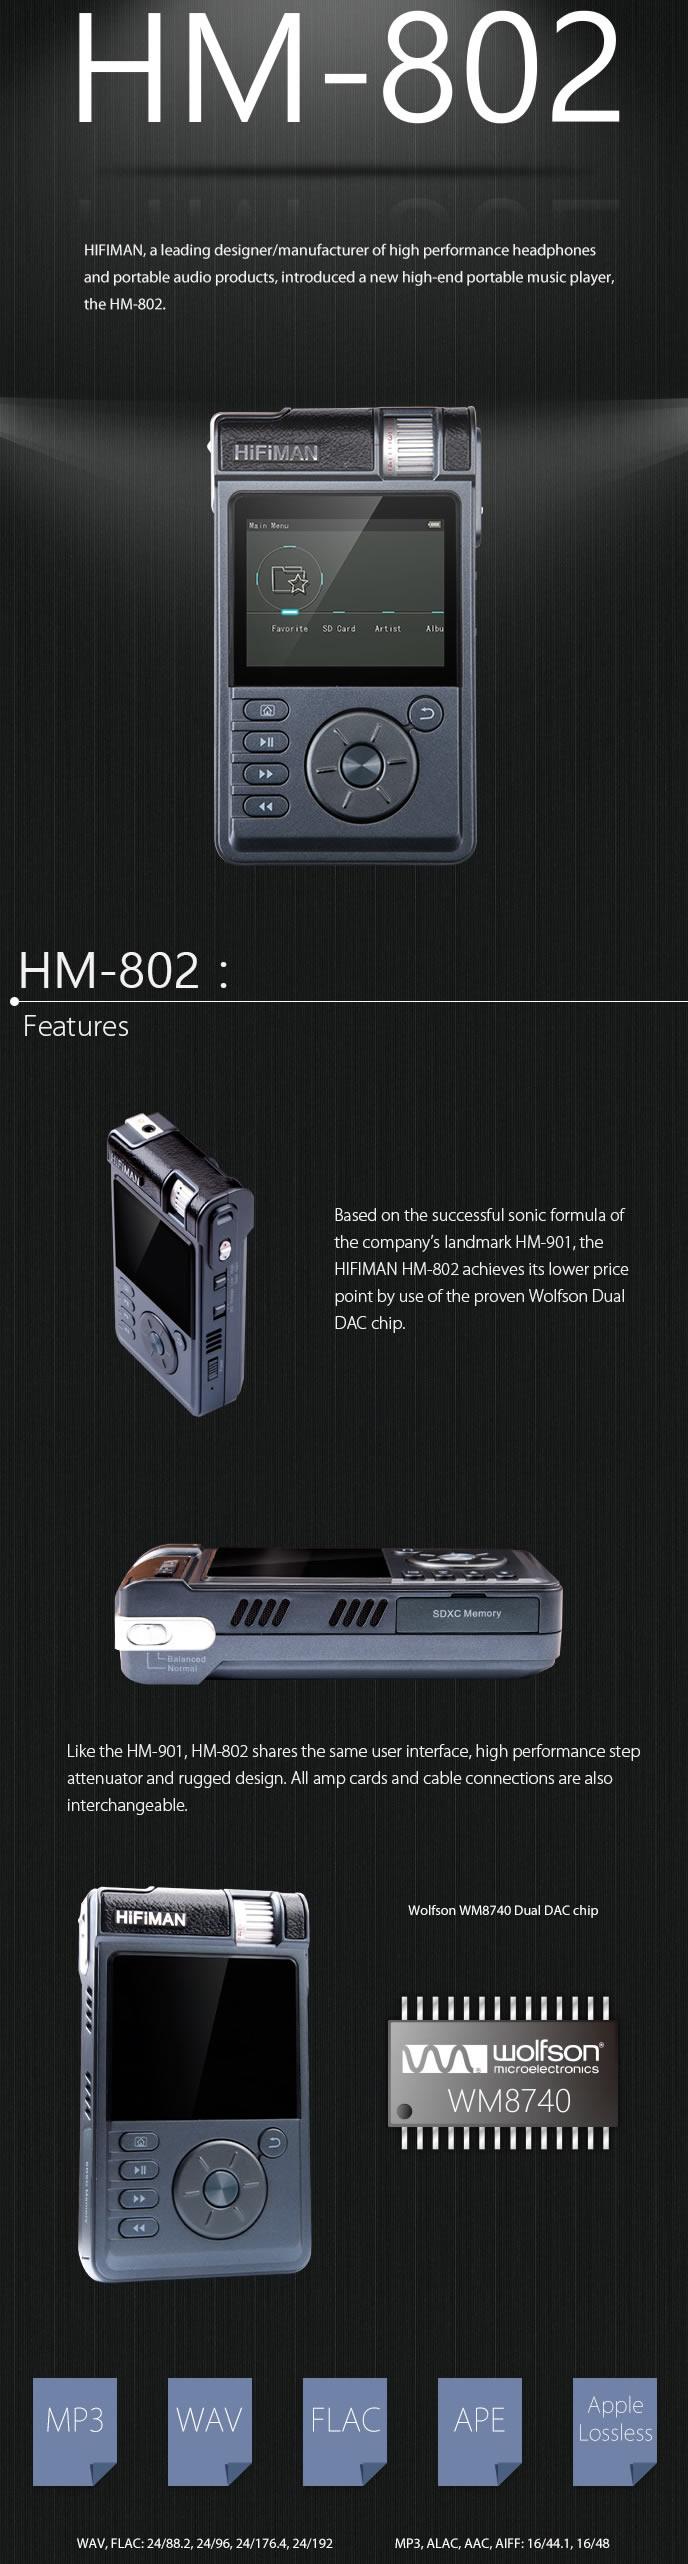 https://www.audiophonics.fr/images2/8551/8551_hifiman_hm-802_baladeur_1.jpg